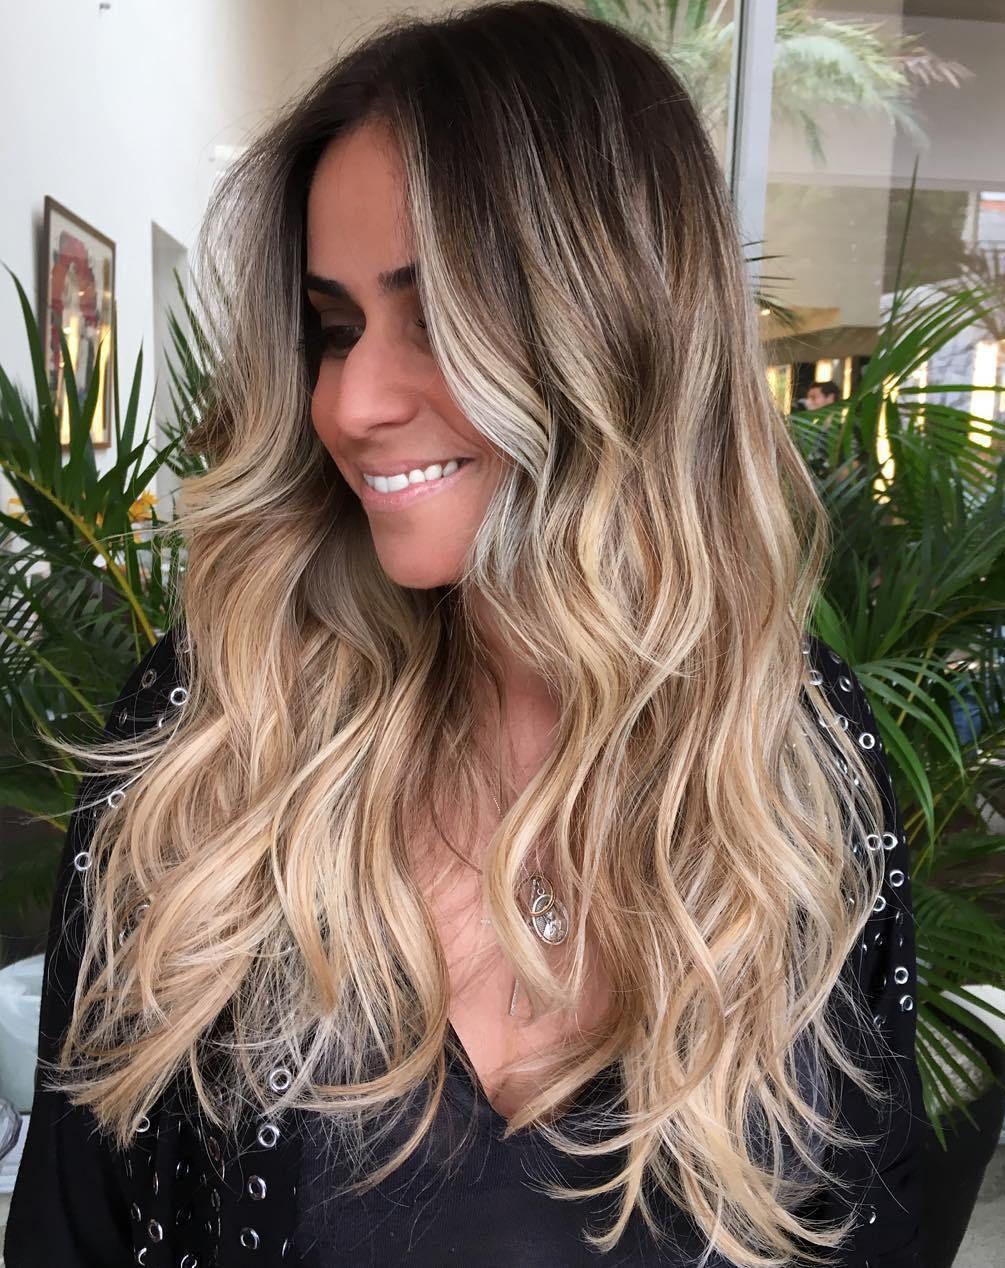 20 Inspiring Beach Hair Ideas for Beautiful Vacation forecasting